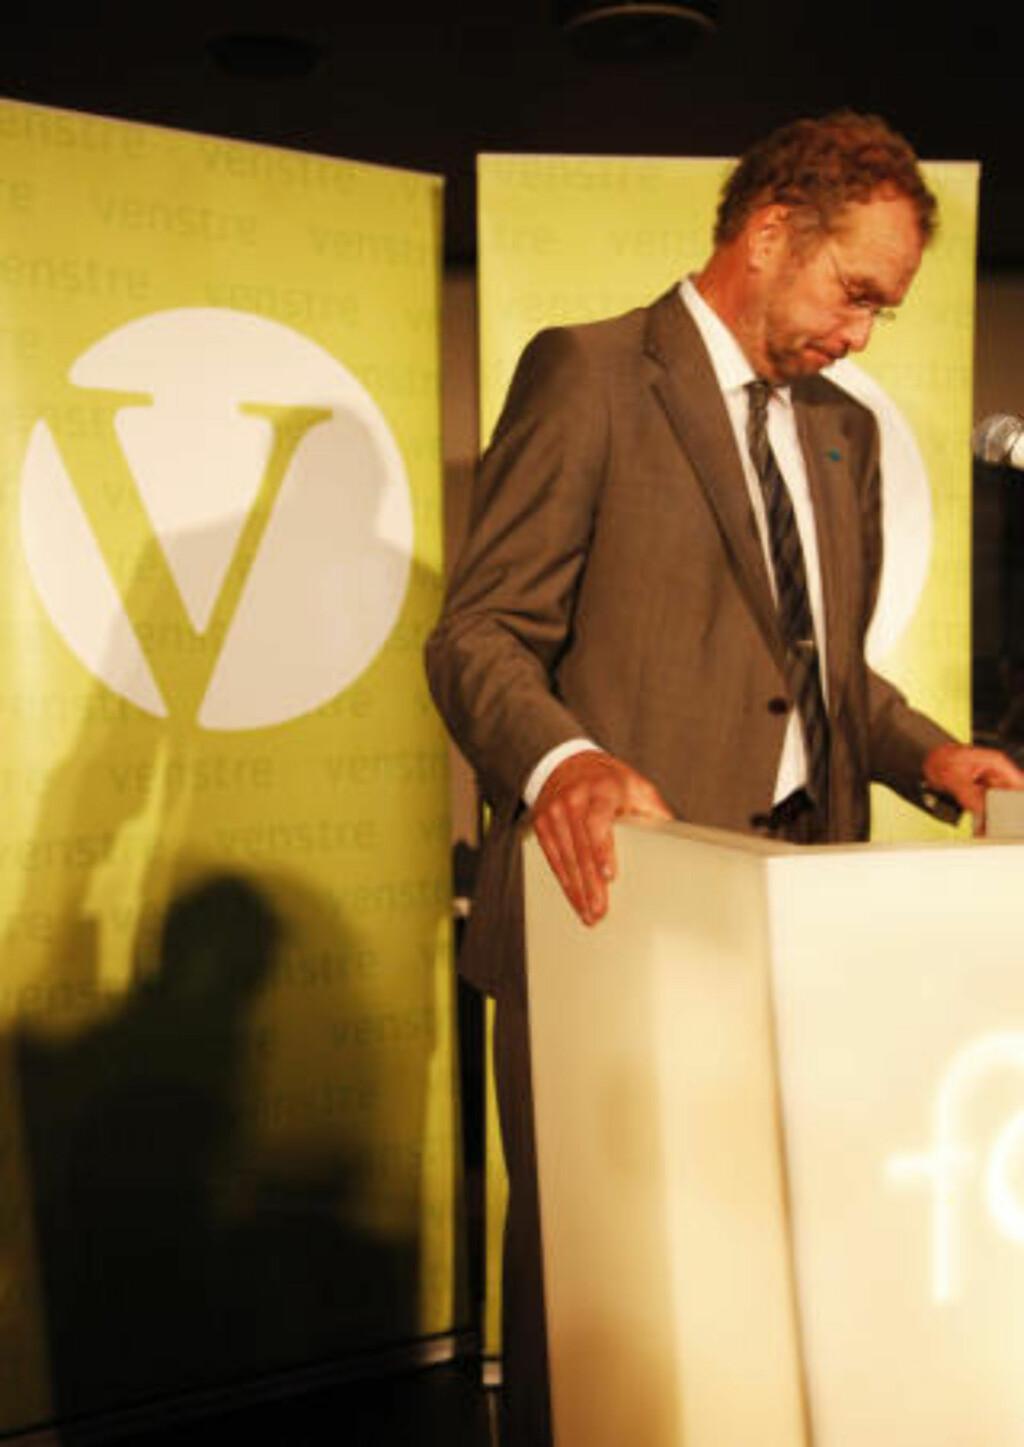 NEDERALGET: Venstres leder Lars Sponheim på talerstolen under Venstres valgvake på restaurant Folk i Folketaterbygningen i Oslo valgkvelden. Foto: Erik Johansen / Scanpix